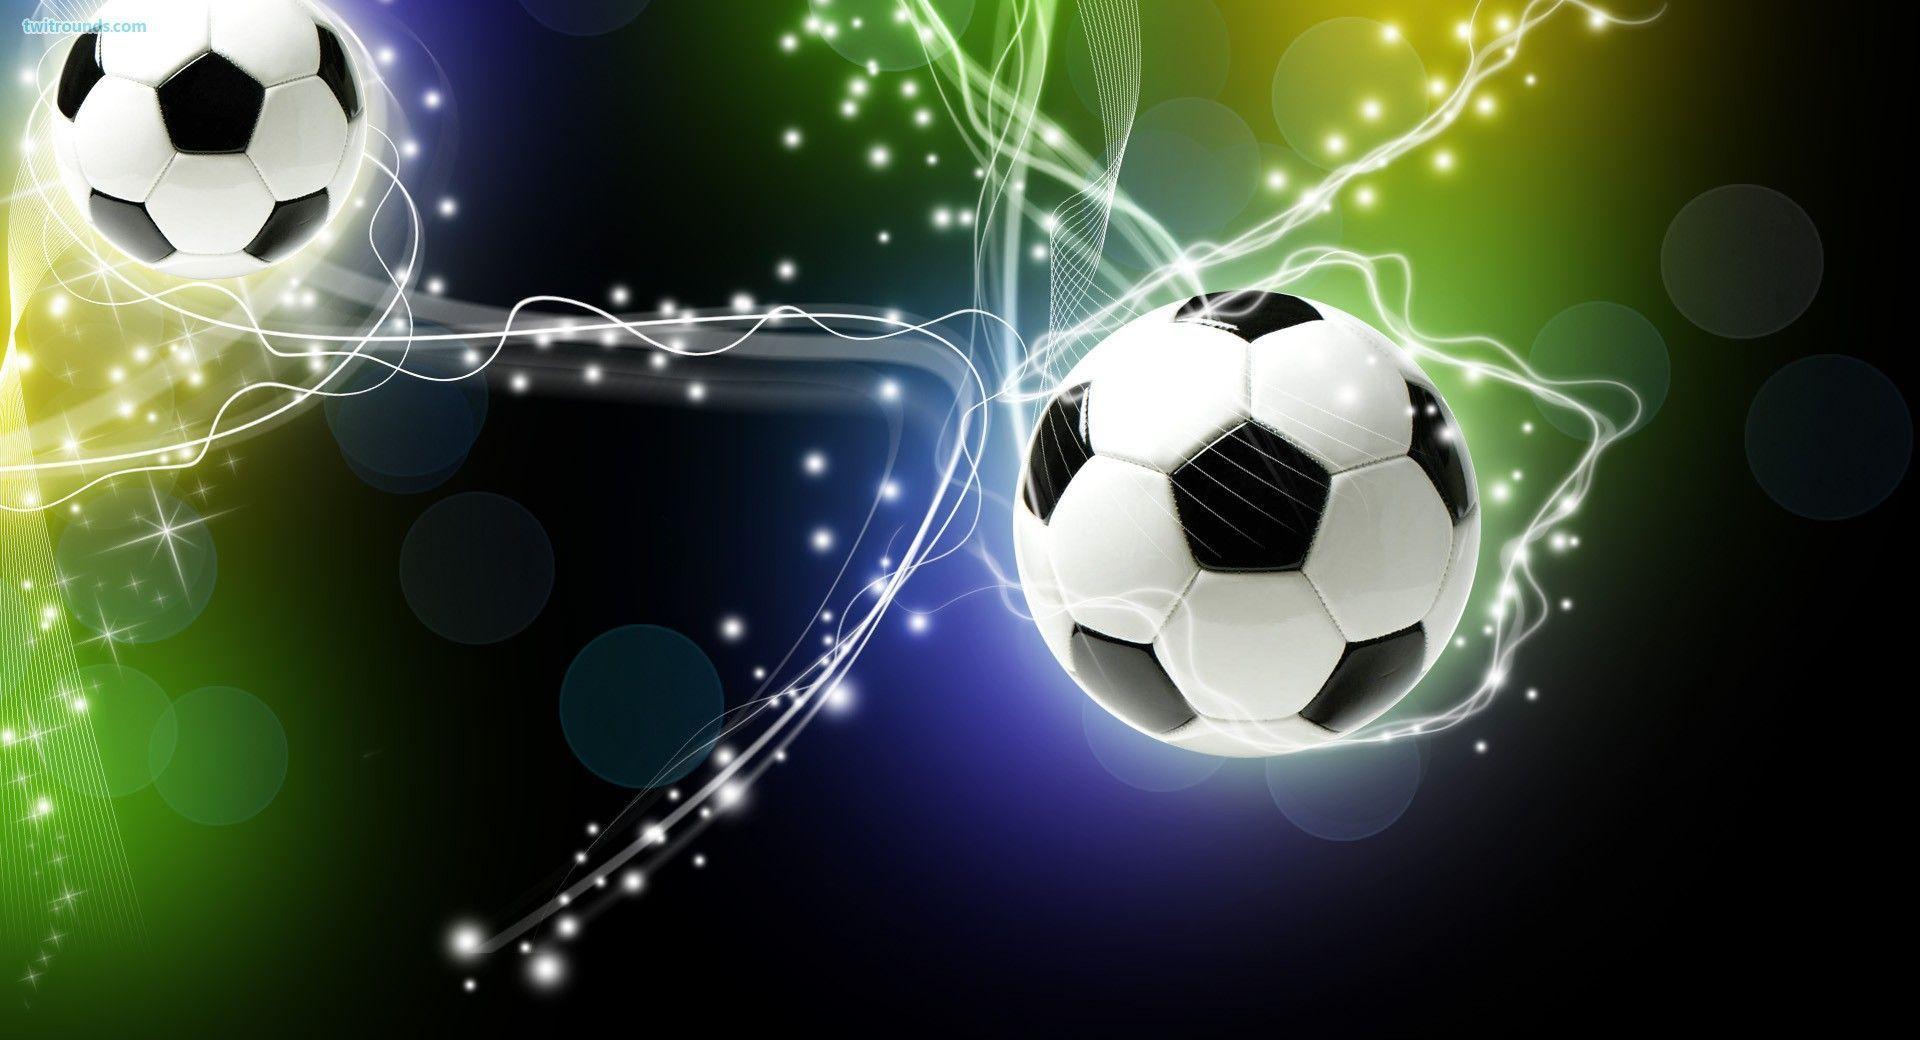 cool soccer backgrounds wallpaper hd wallpapers pinterest